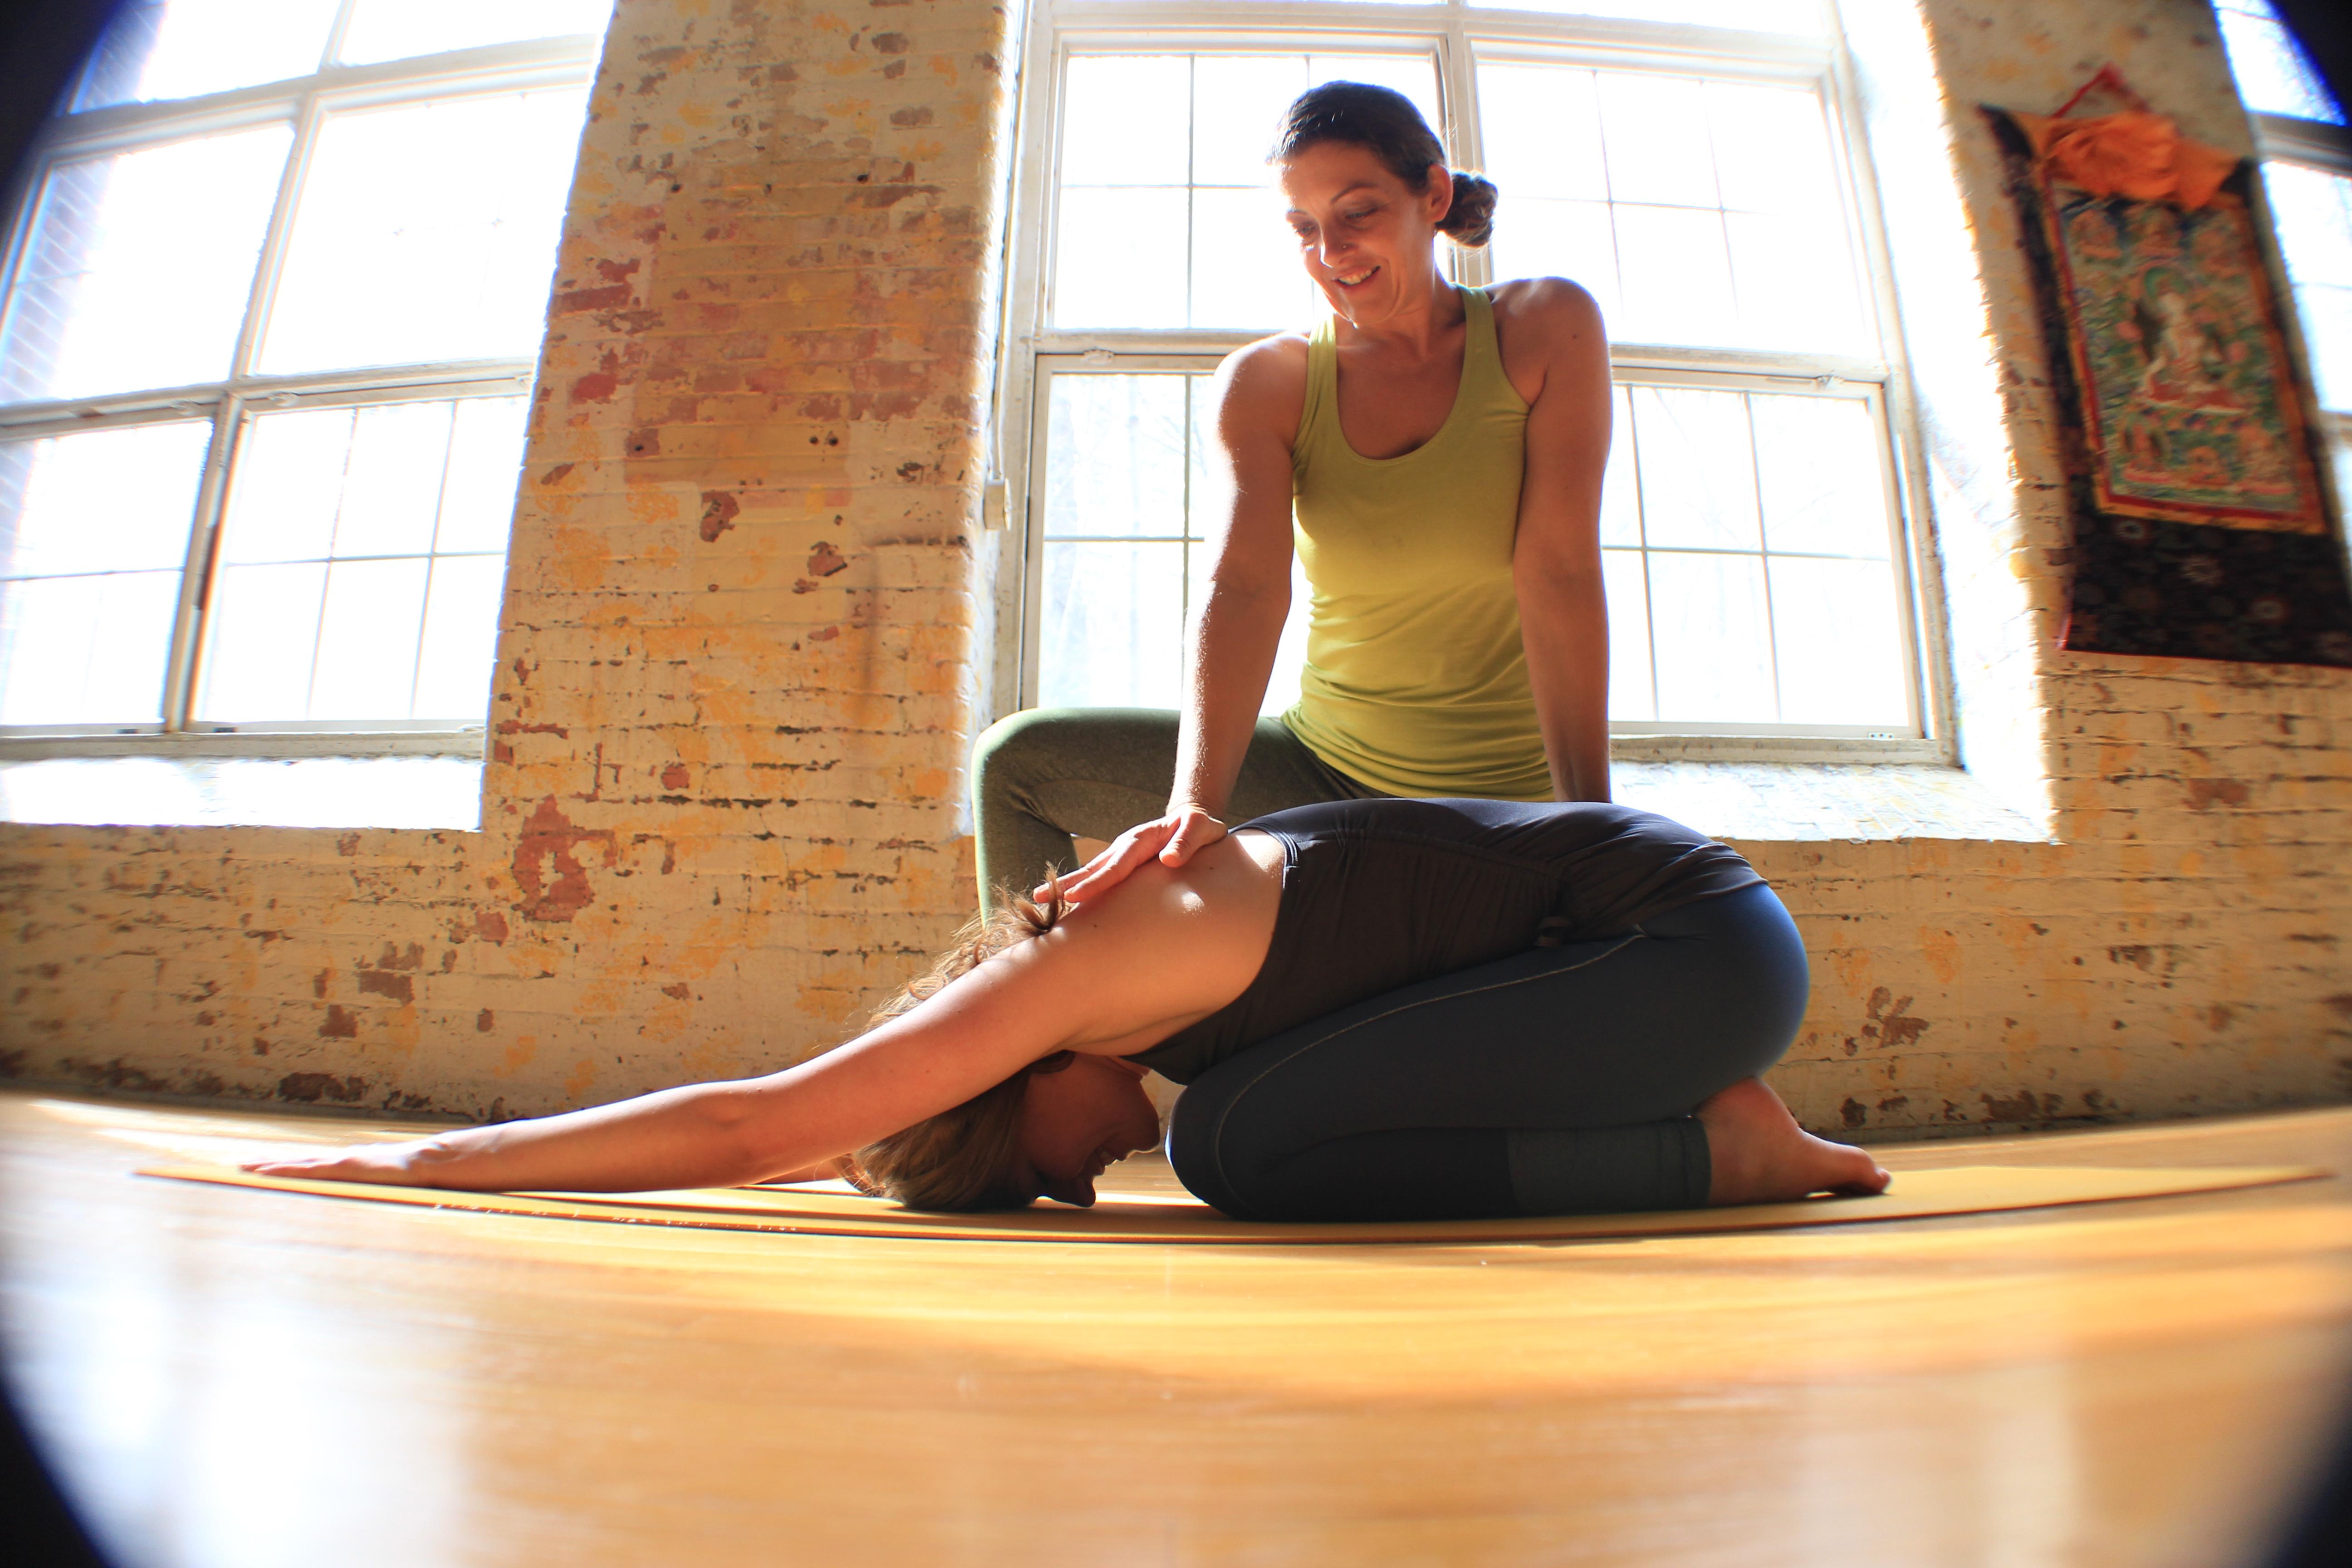 200 Hour Yoga Alliance Rys Yoga Teacher Training Fitness Recreation Center Boston University